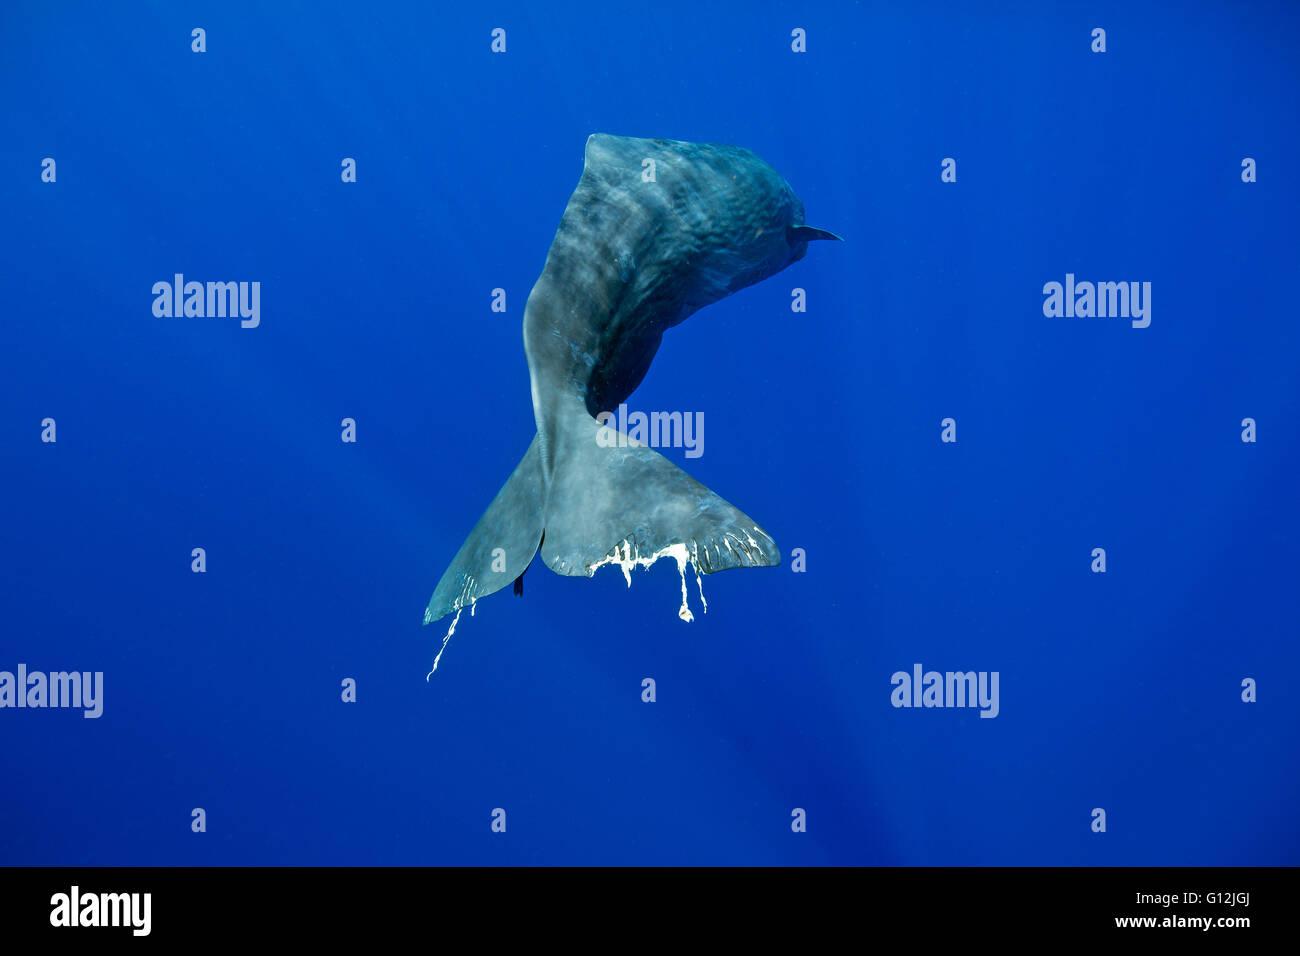 Sperm Whale, Physeter macrocephalus, Caribbean Sea, Dominica - Stock Image